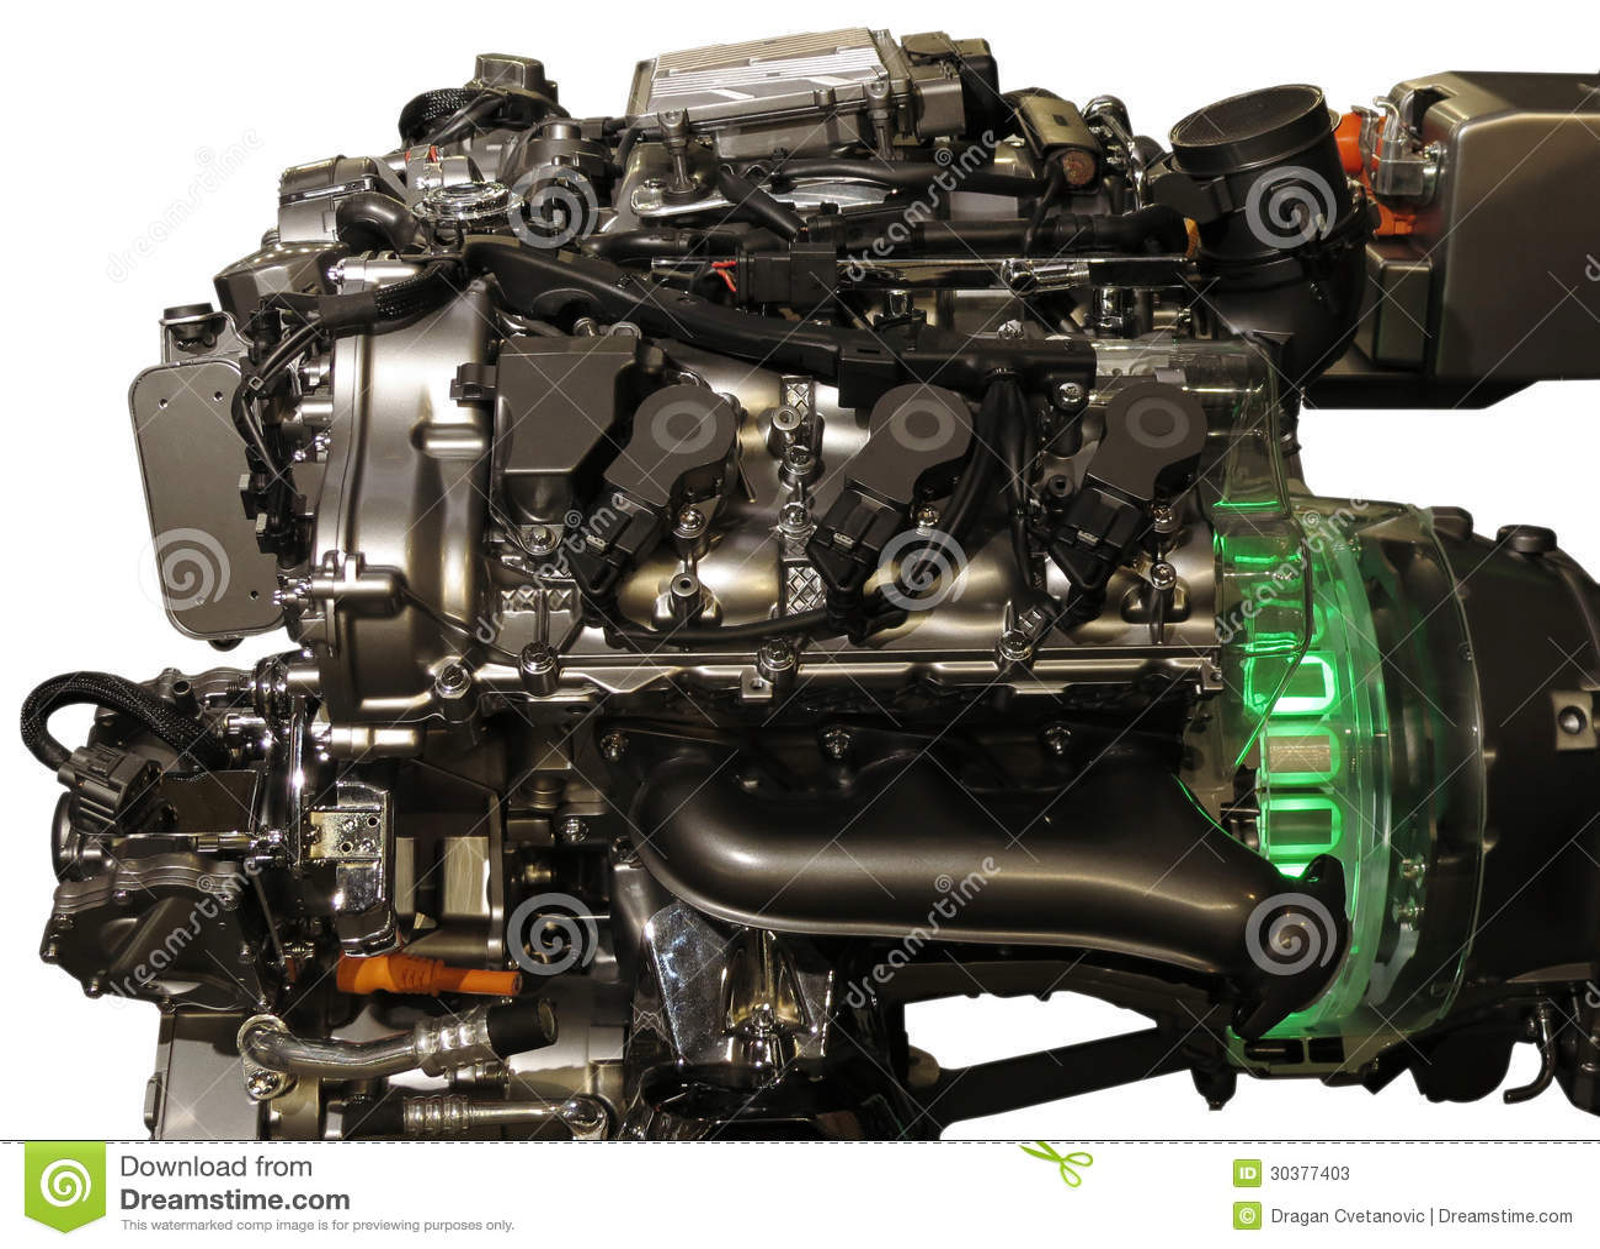 Hybrid Car Engine From S Class Mercedes Stock Photos